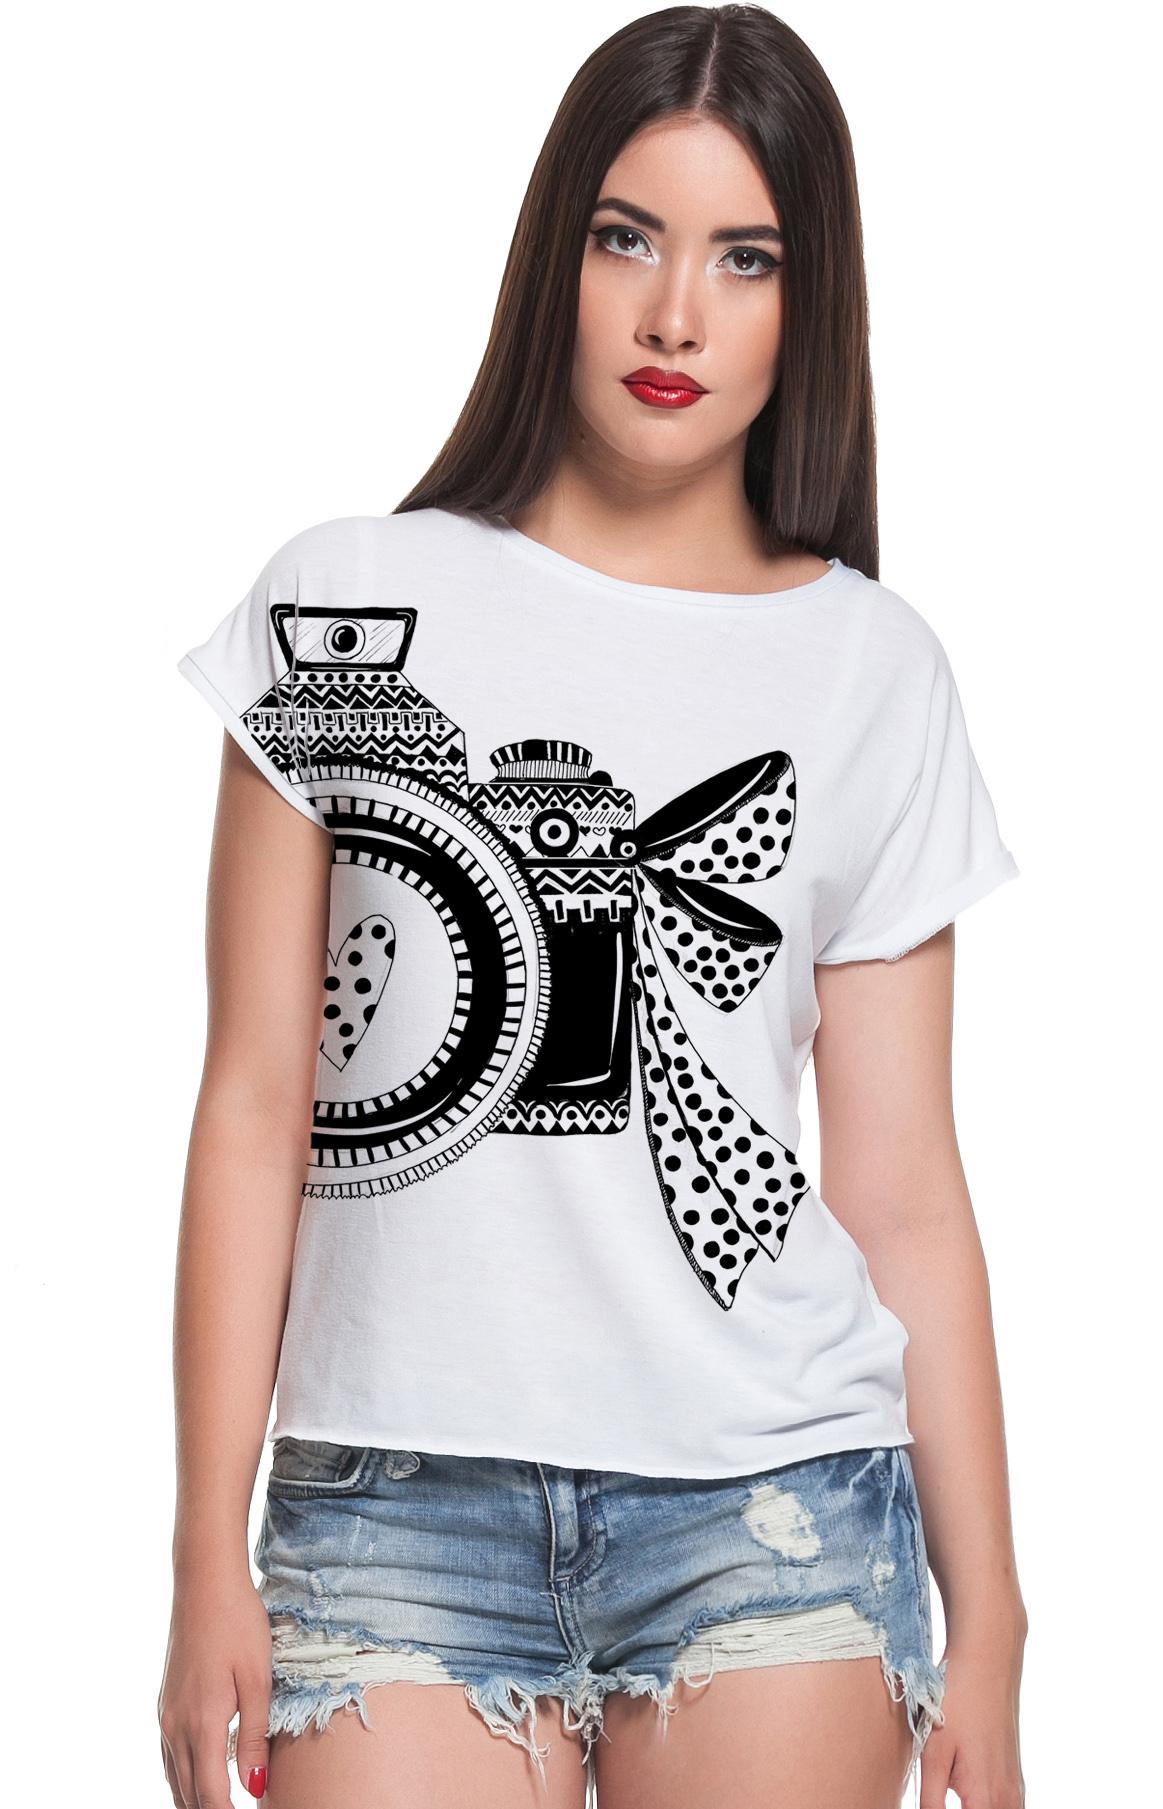 Zaysha dresses collection